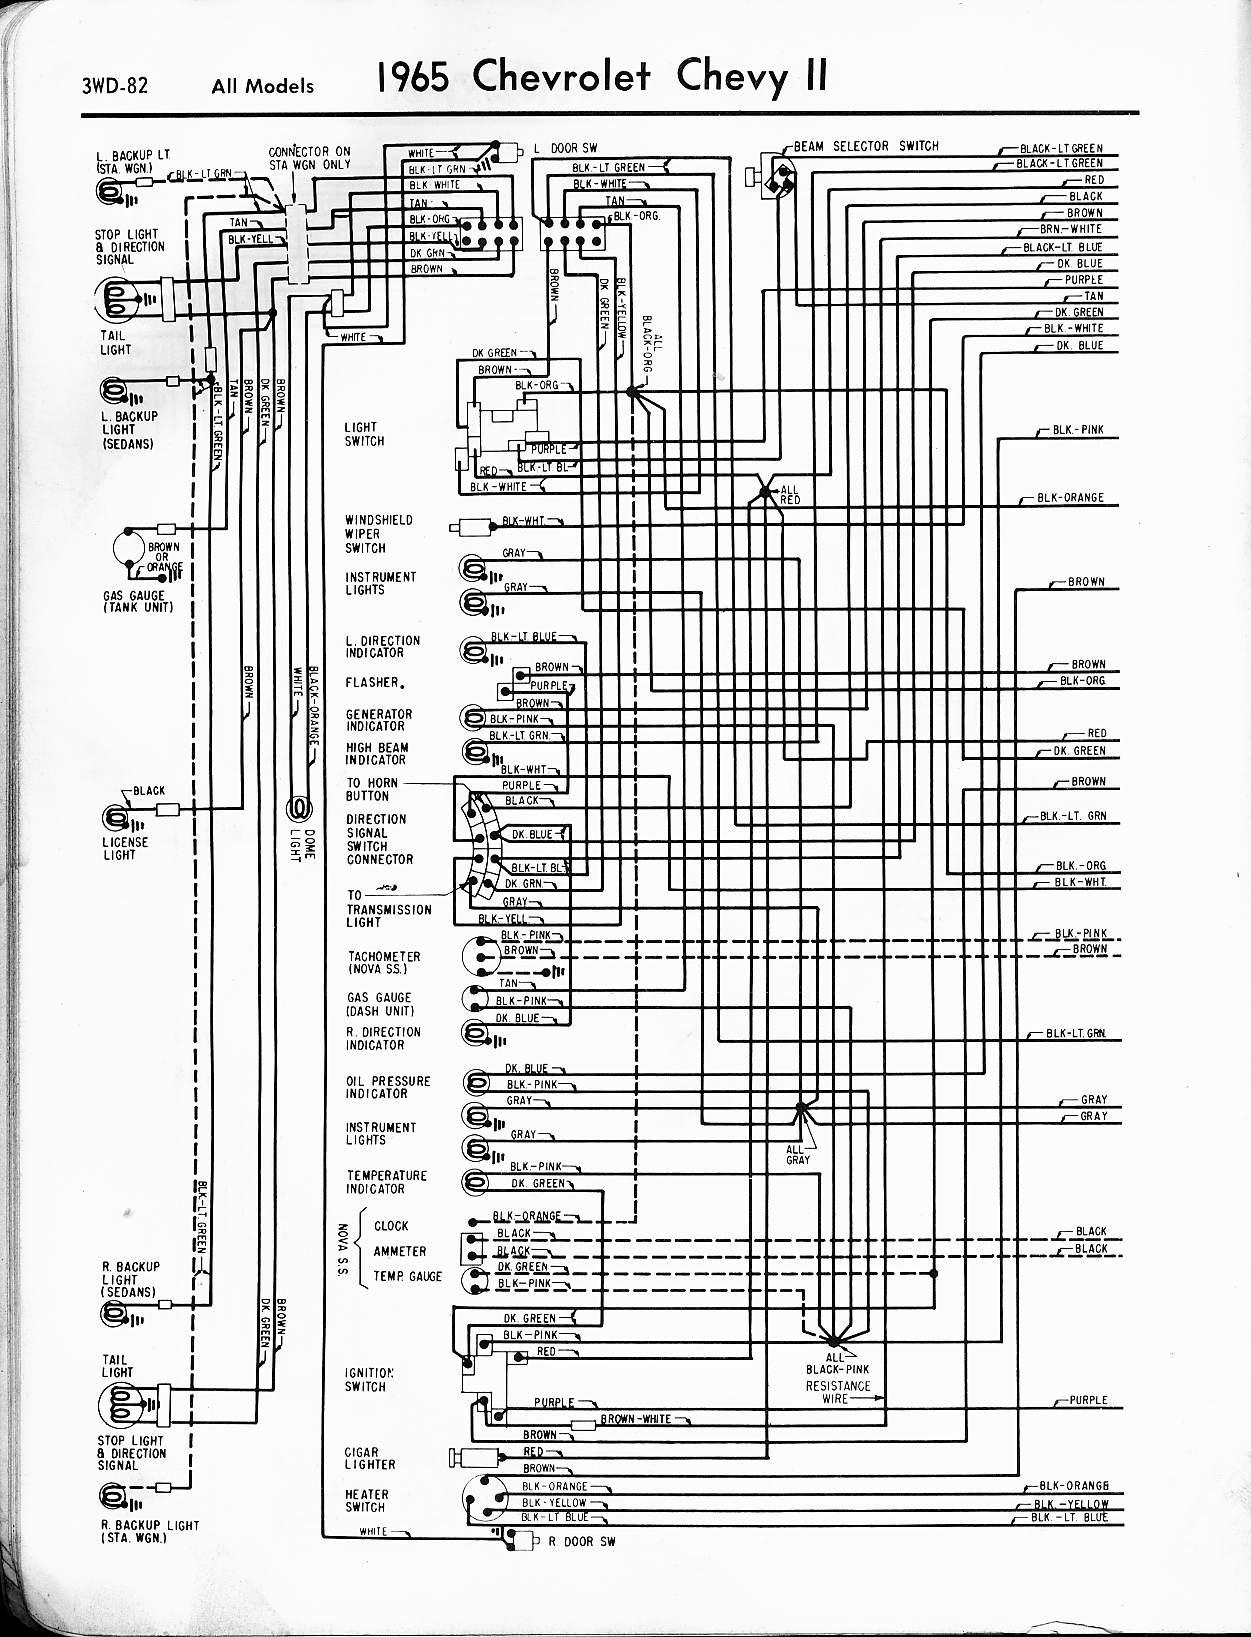 turn signal wiring diagram chevy truck 91 cherokee 1956 steering column silverado